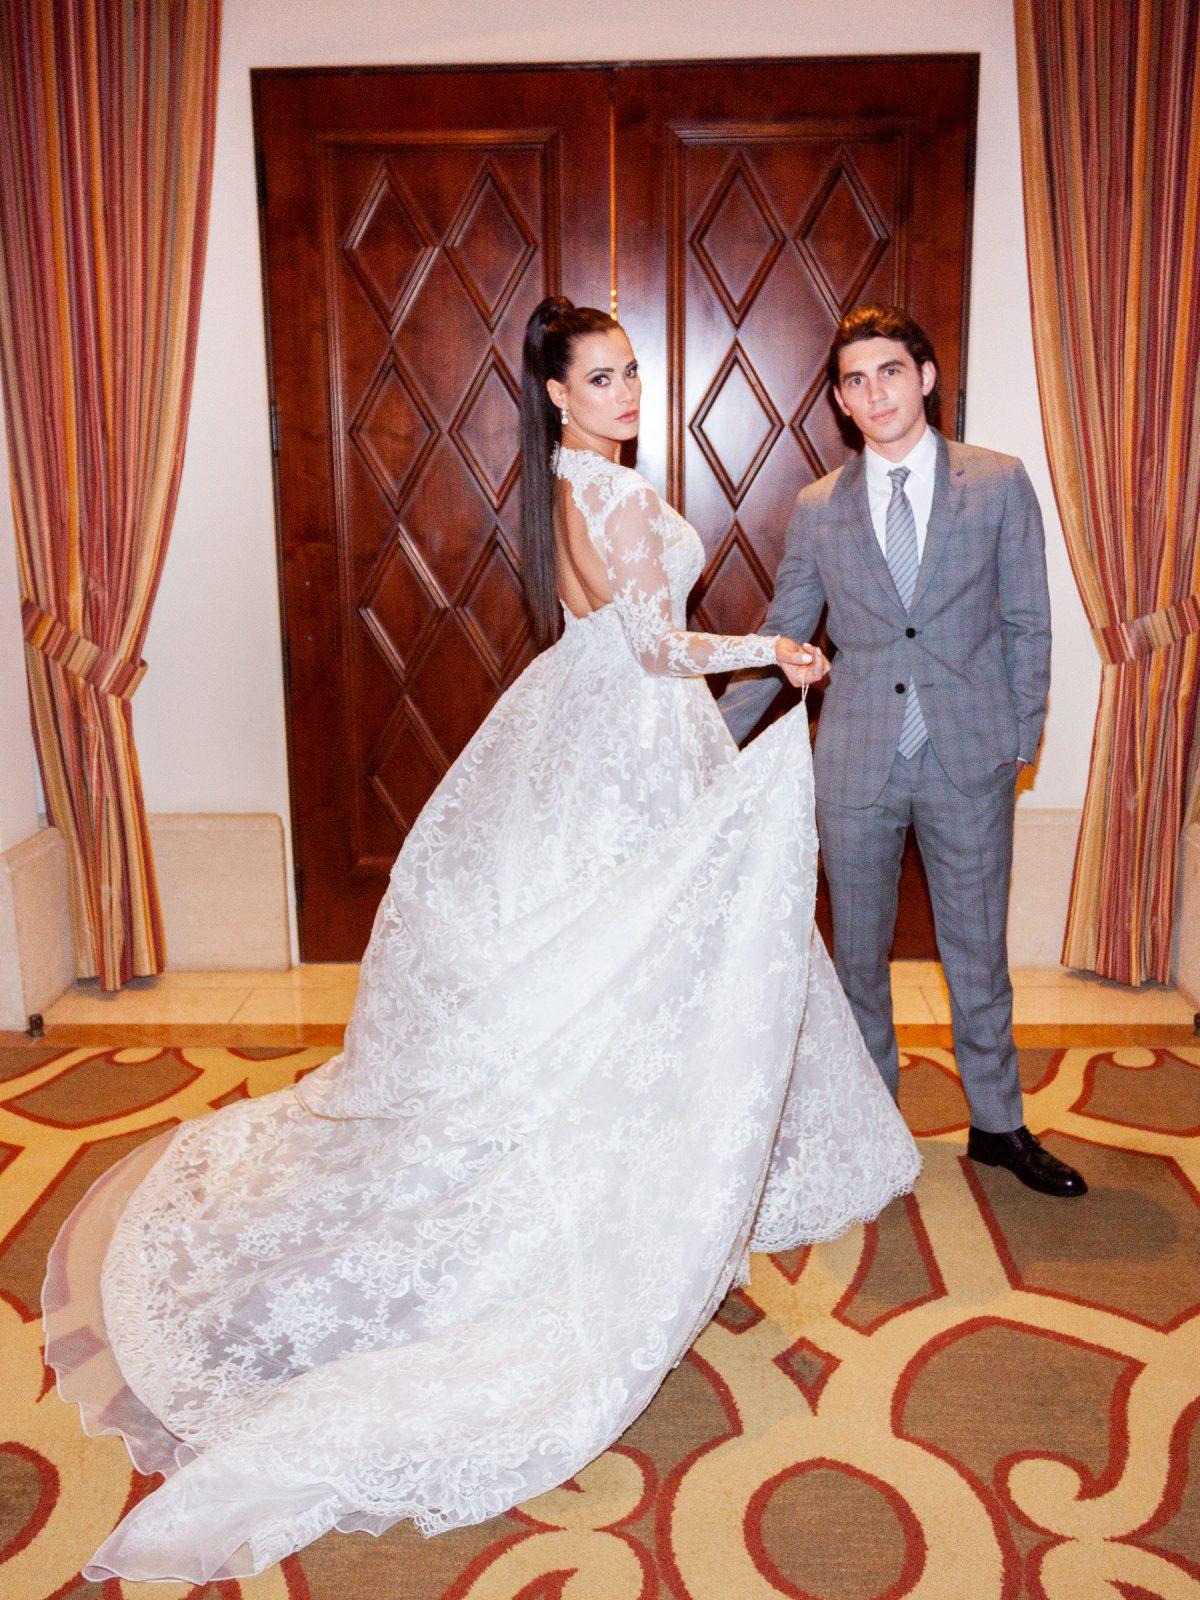 maria-eduardo-montage-beverly-hills-wedding-201.jpg